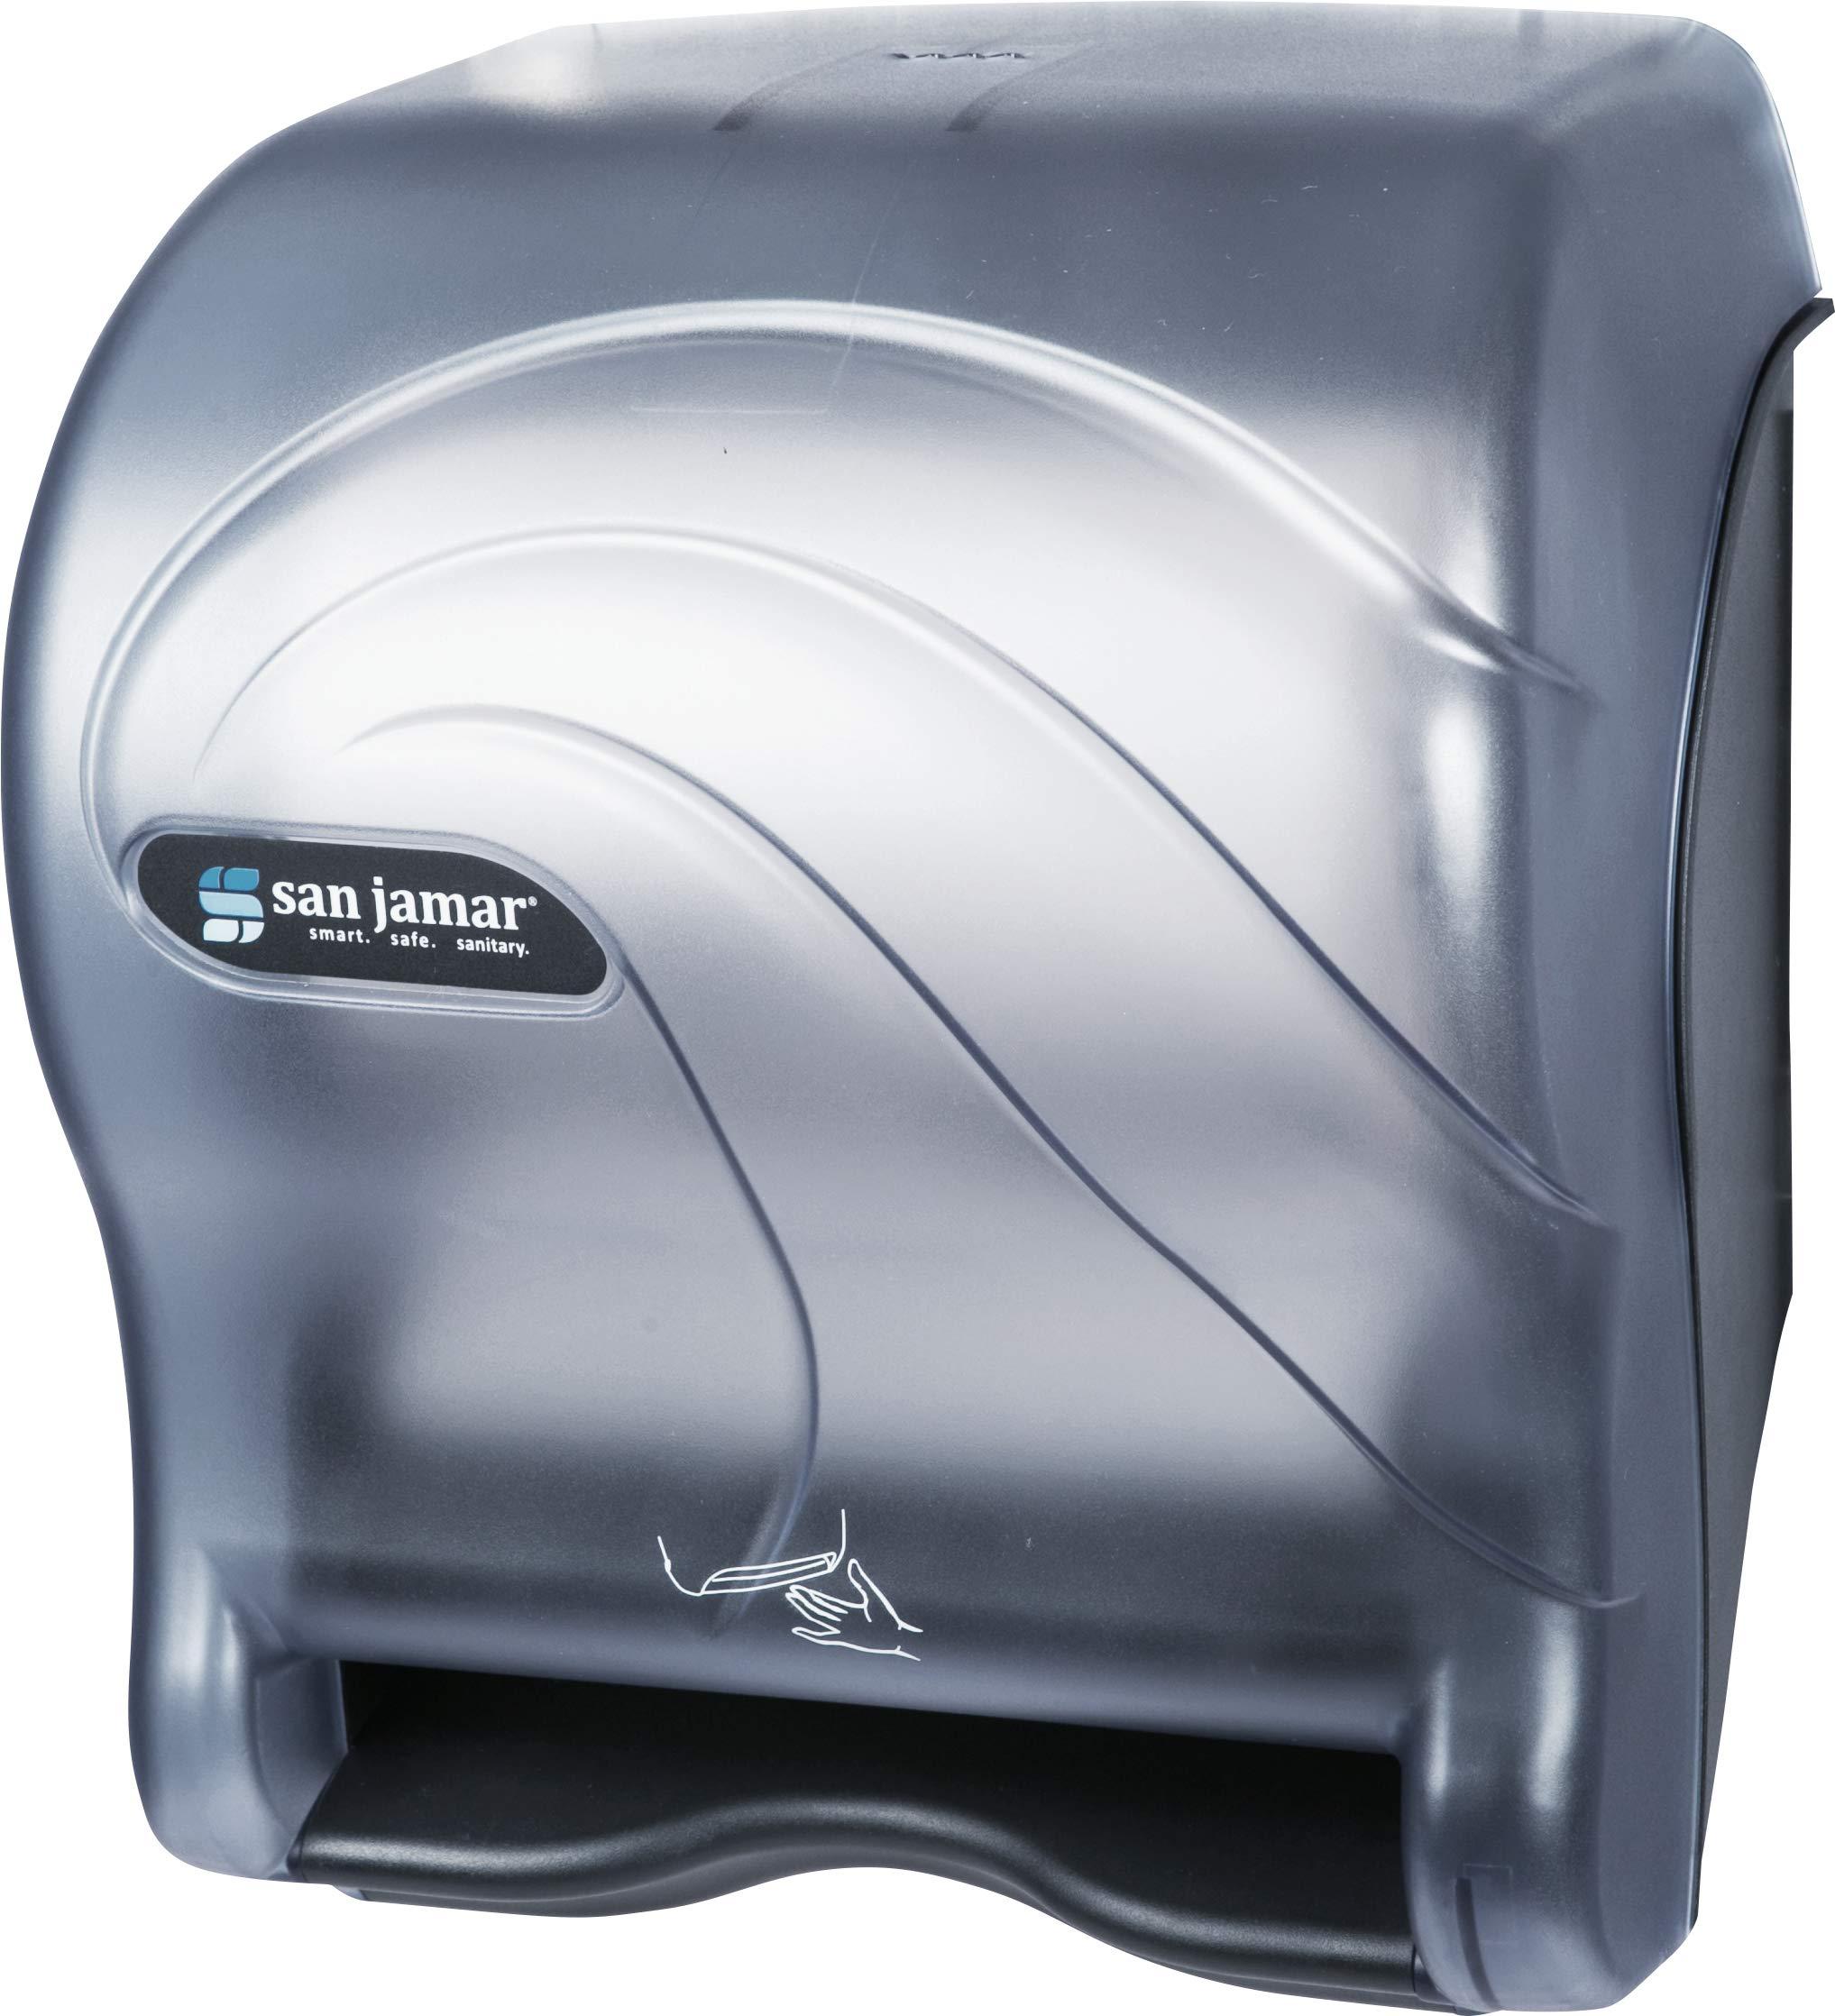 San Jamar T8490TBL Smart Essence Oceans Hands Free Paper Towel Dispenser, Arctic Blue